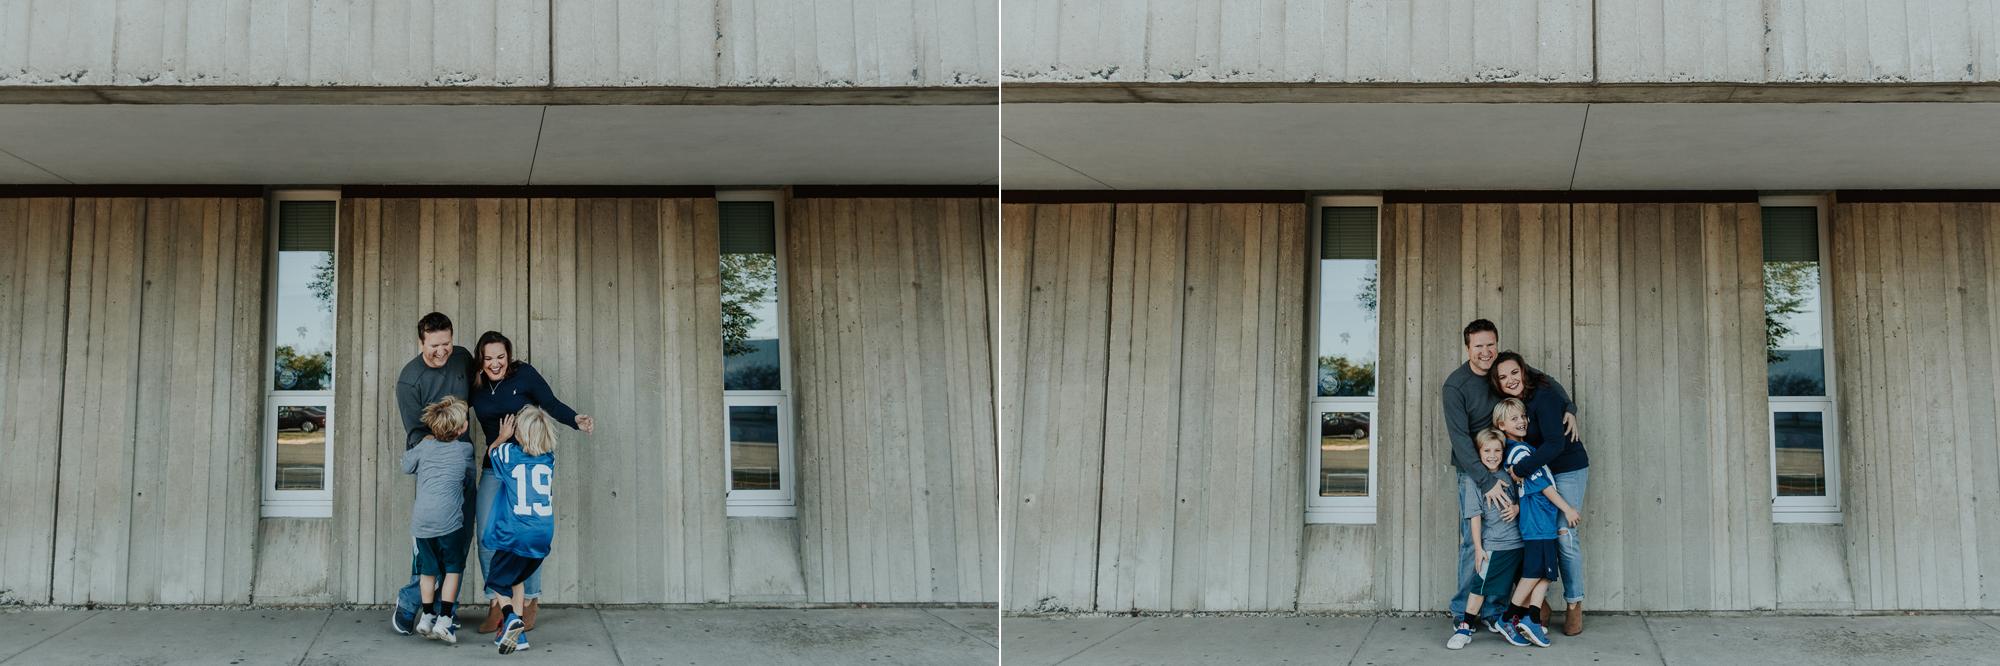 008-storyboard.jpg